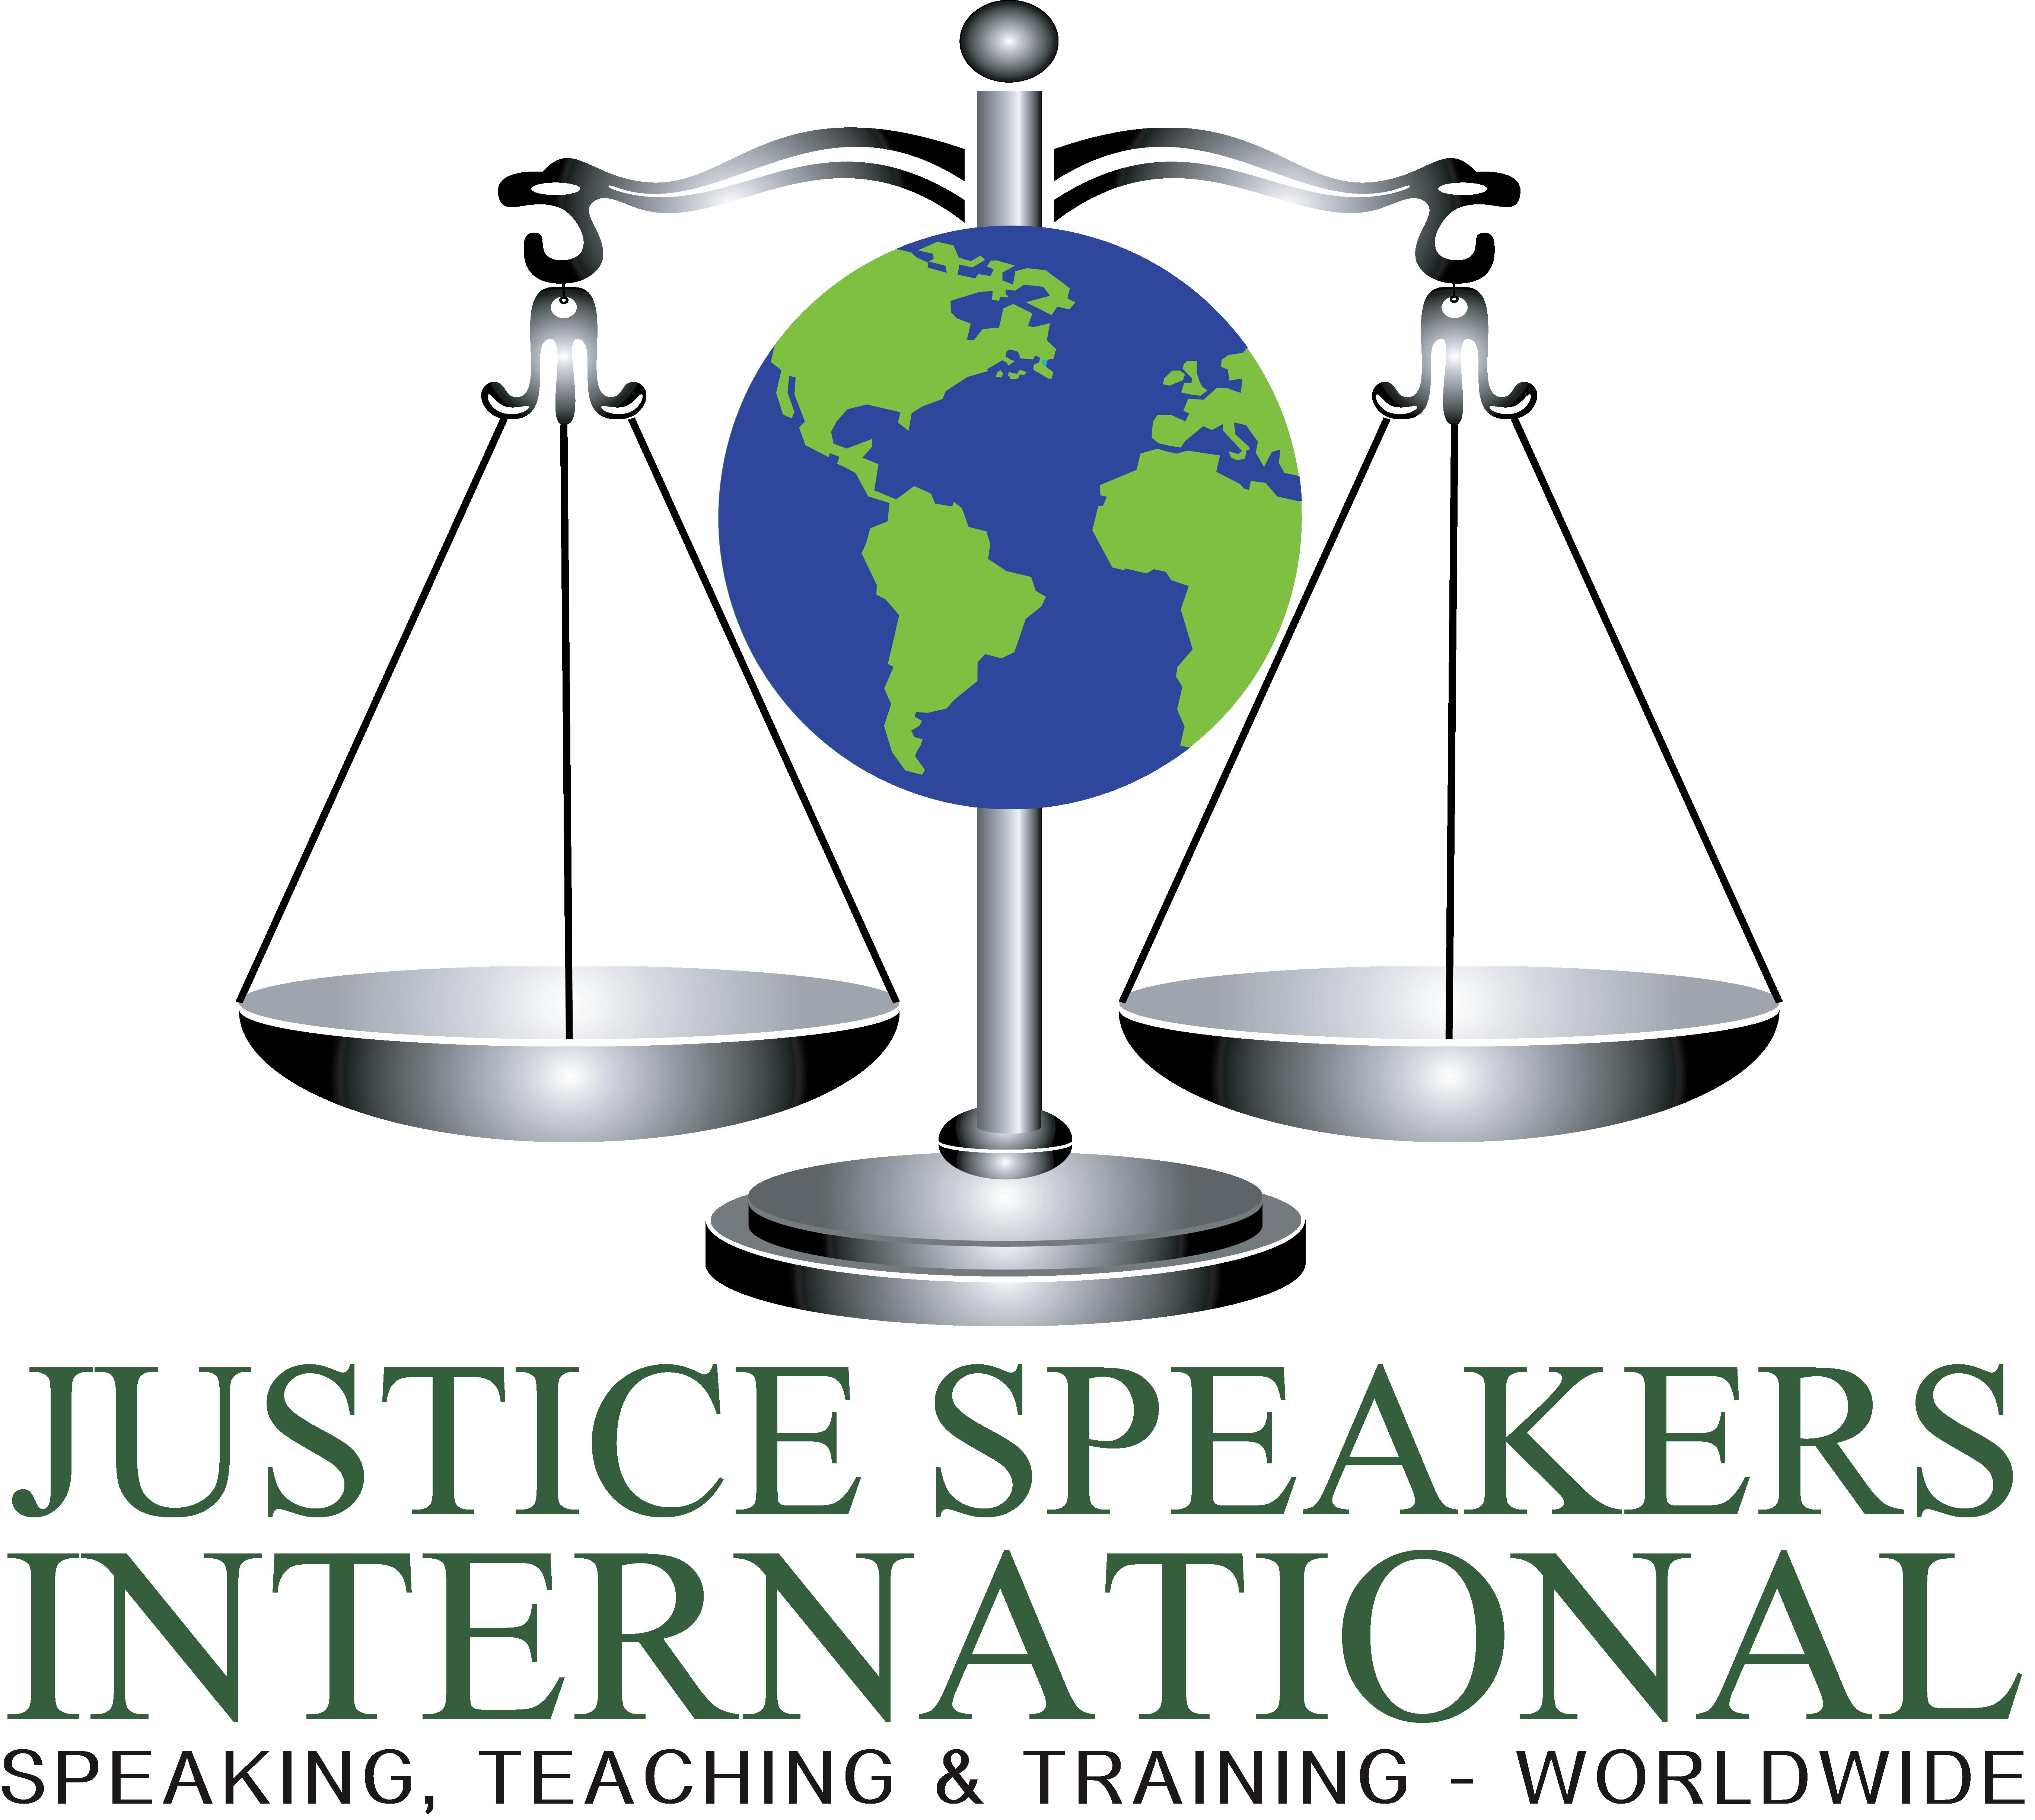 Js international png speakers. Clipart world social justice